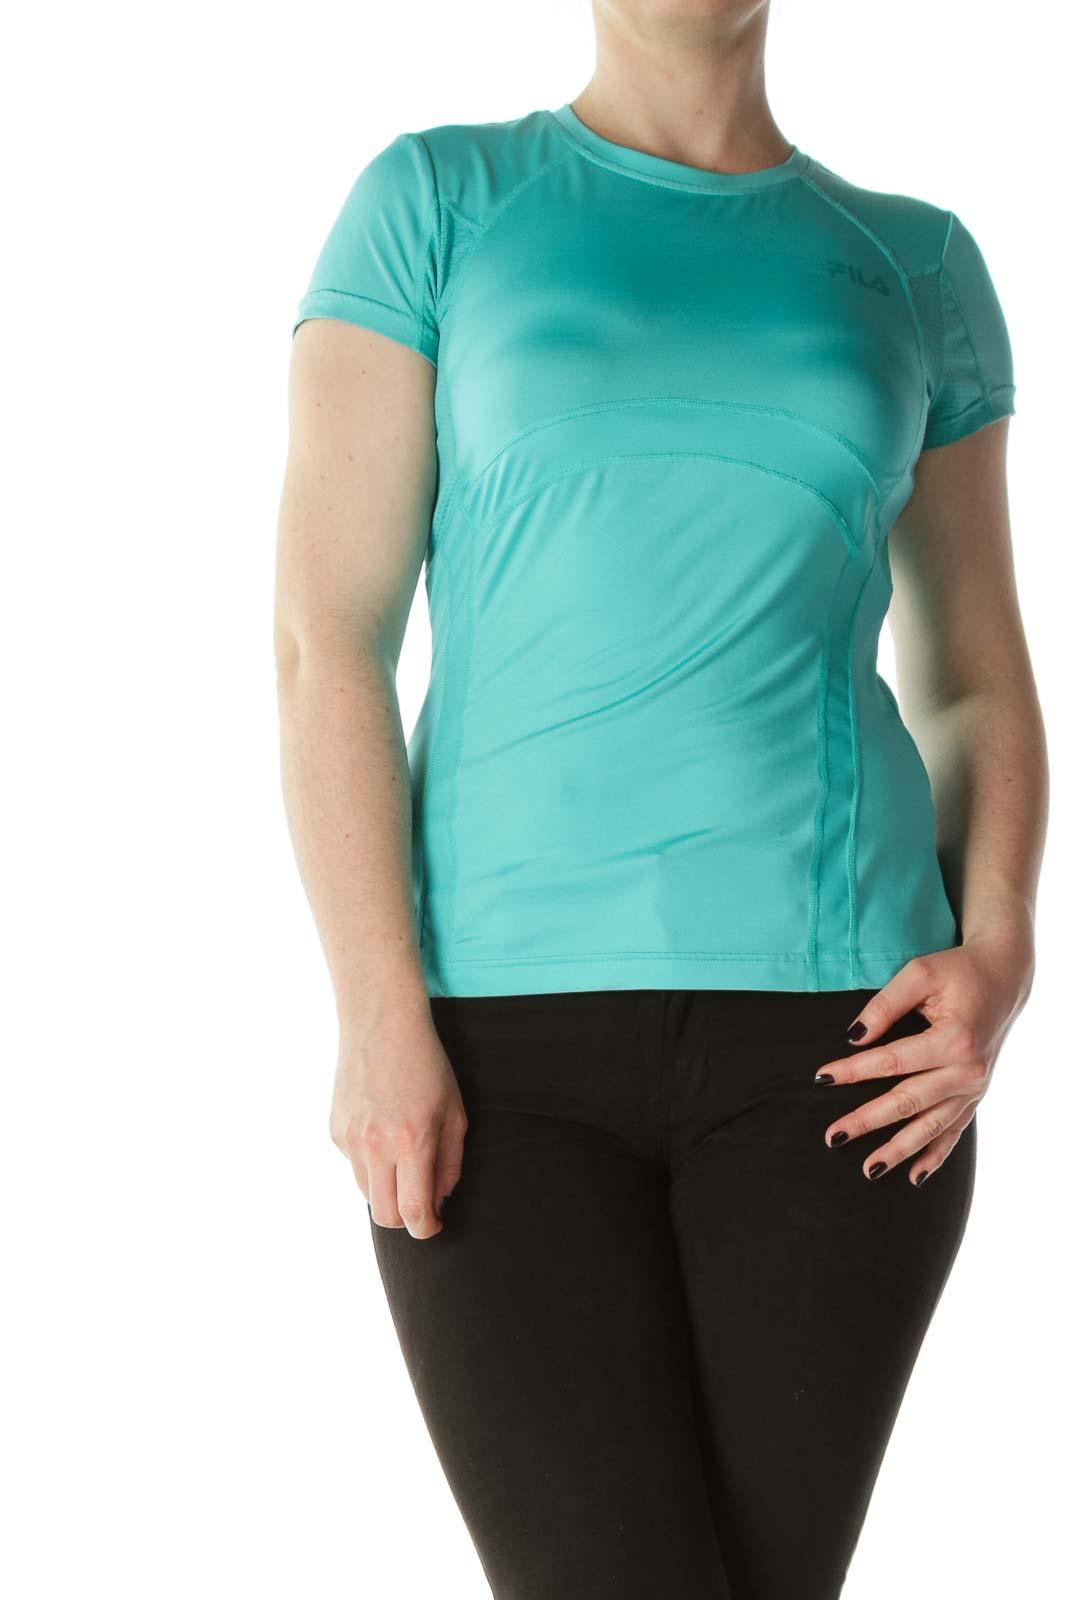 Mint-Green Short-Sleeve Sports Top